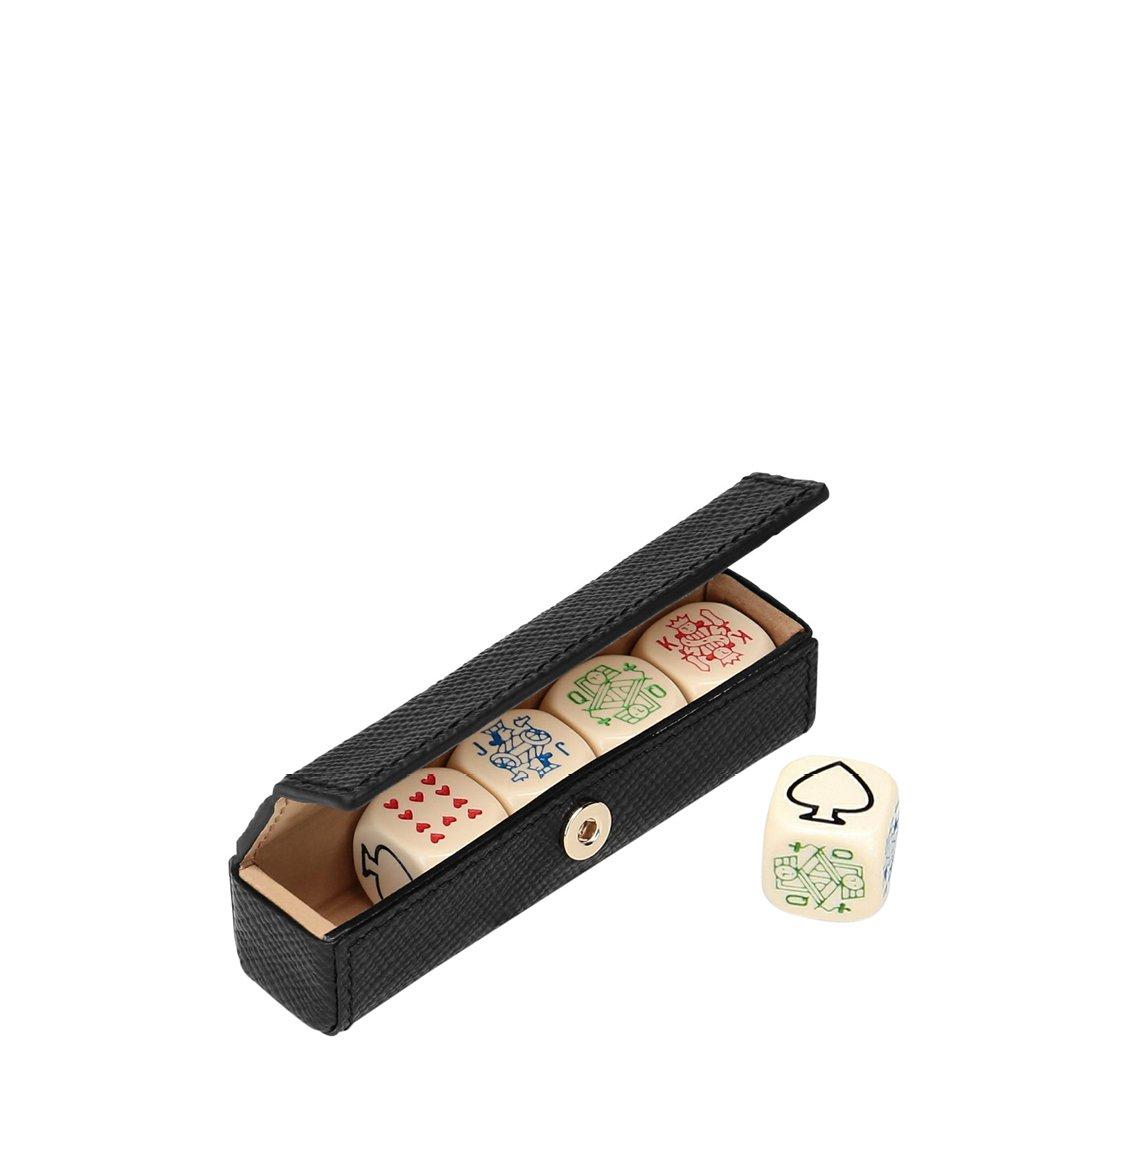 Smythson Panama Cross-Grain Leather Panama 5 Poker Dice